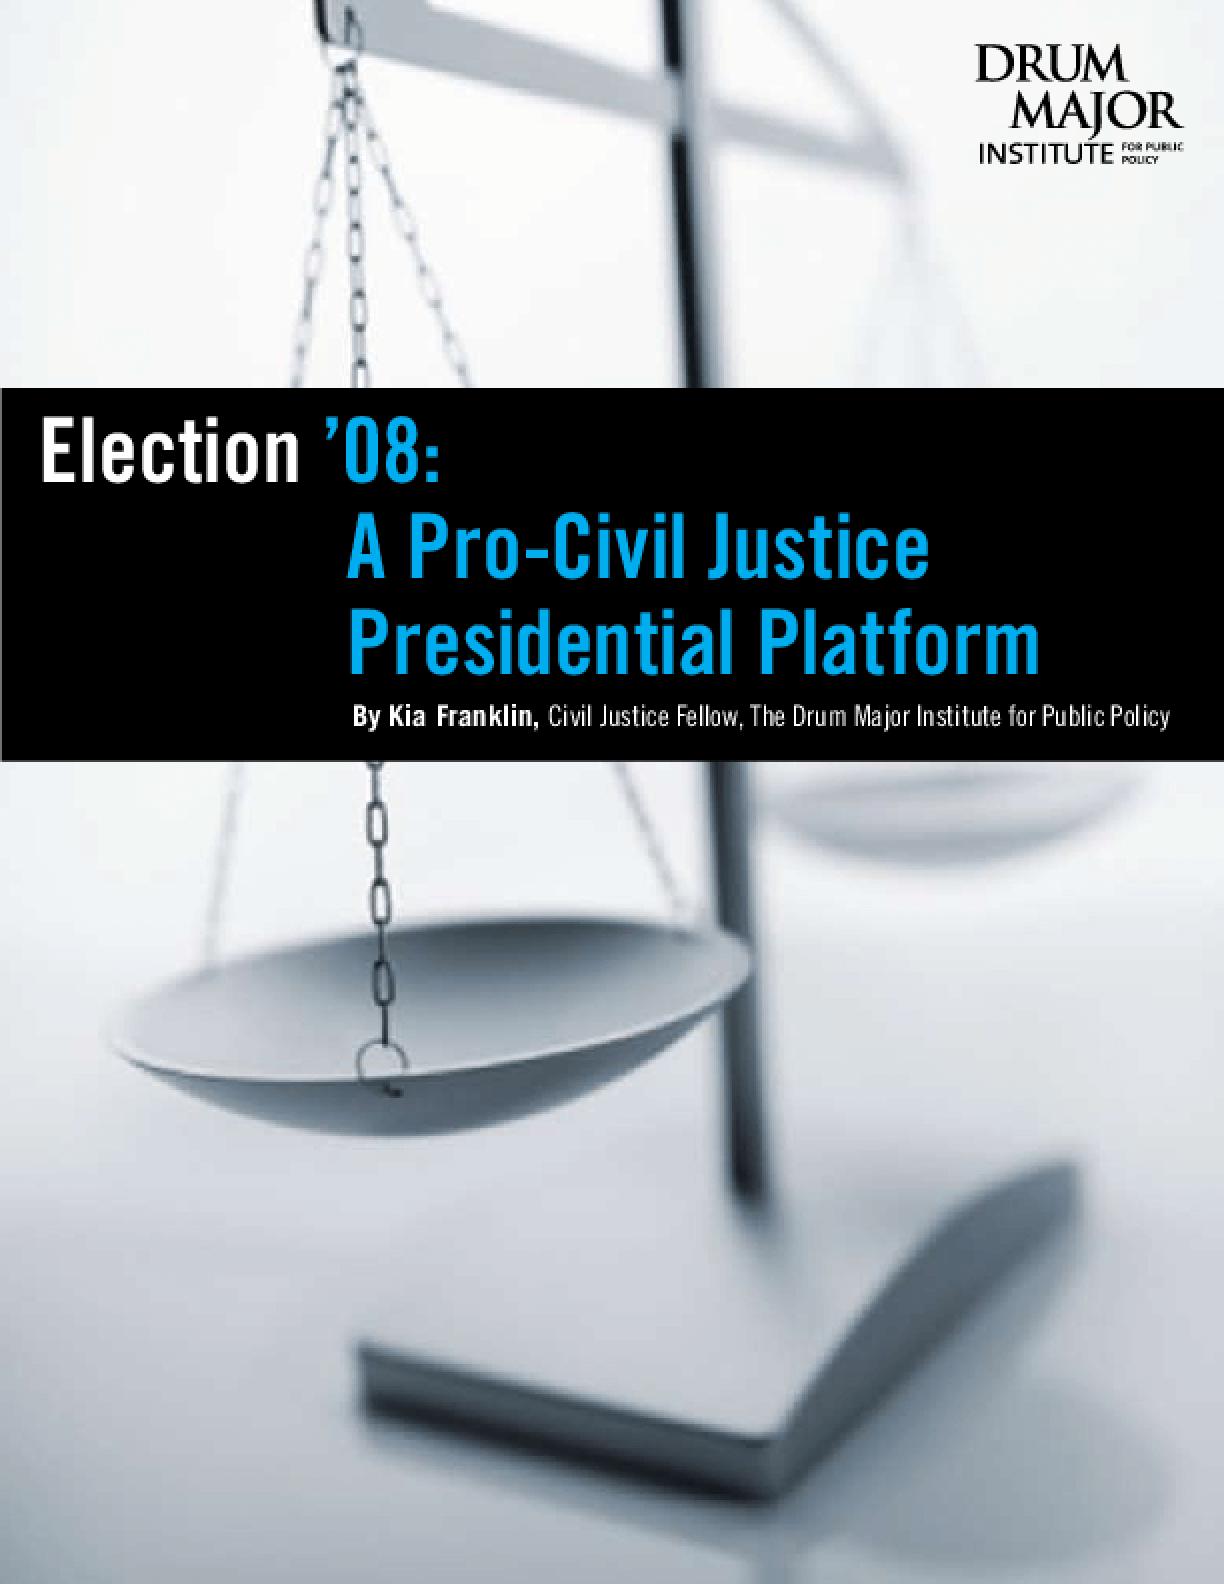 Election '08: A Pro-Civil Justice Presidential Platform